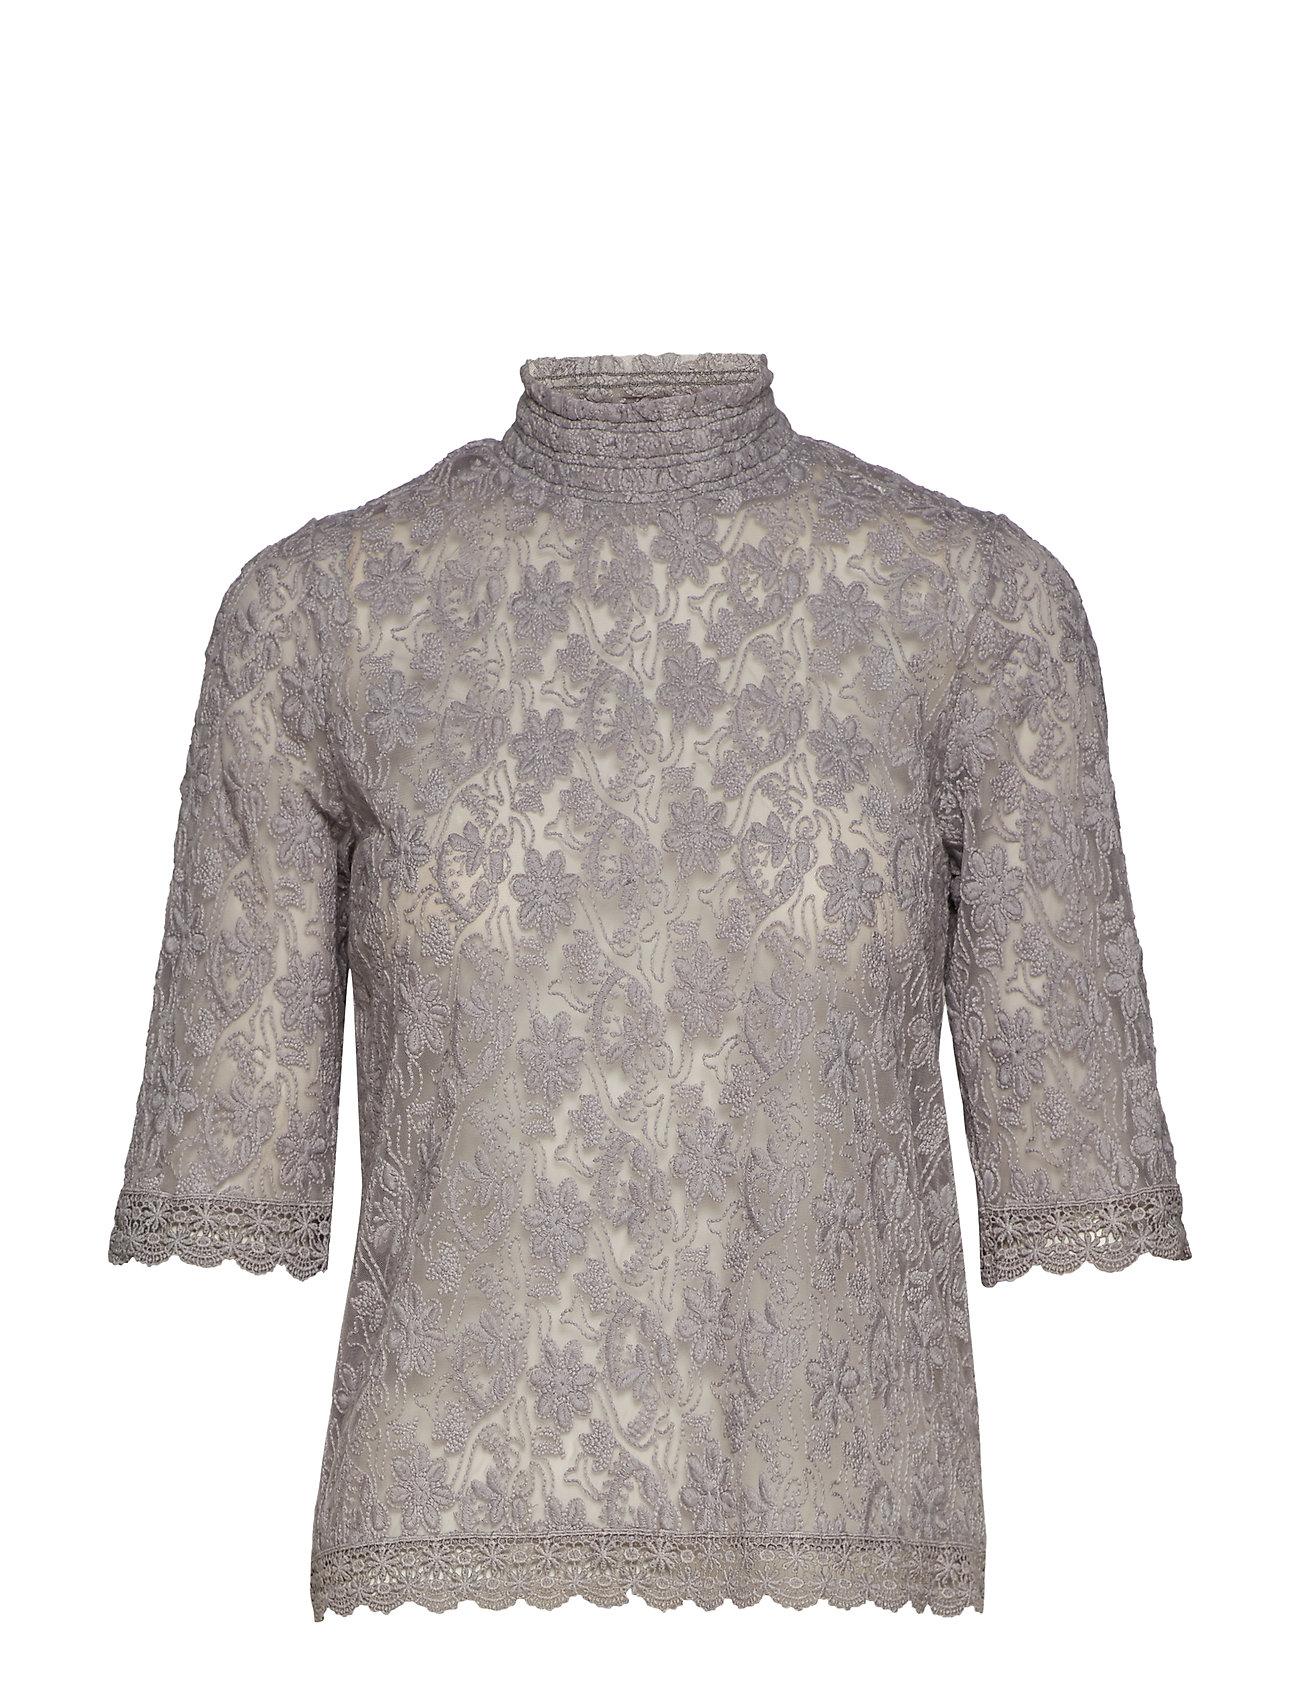 ODD MOLLY sway high blouse - MID GREY